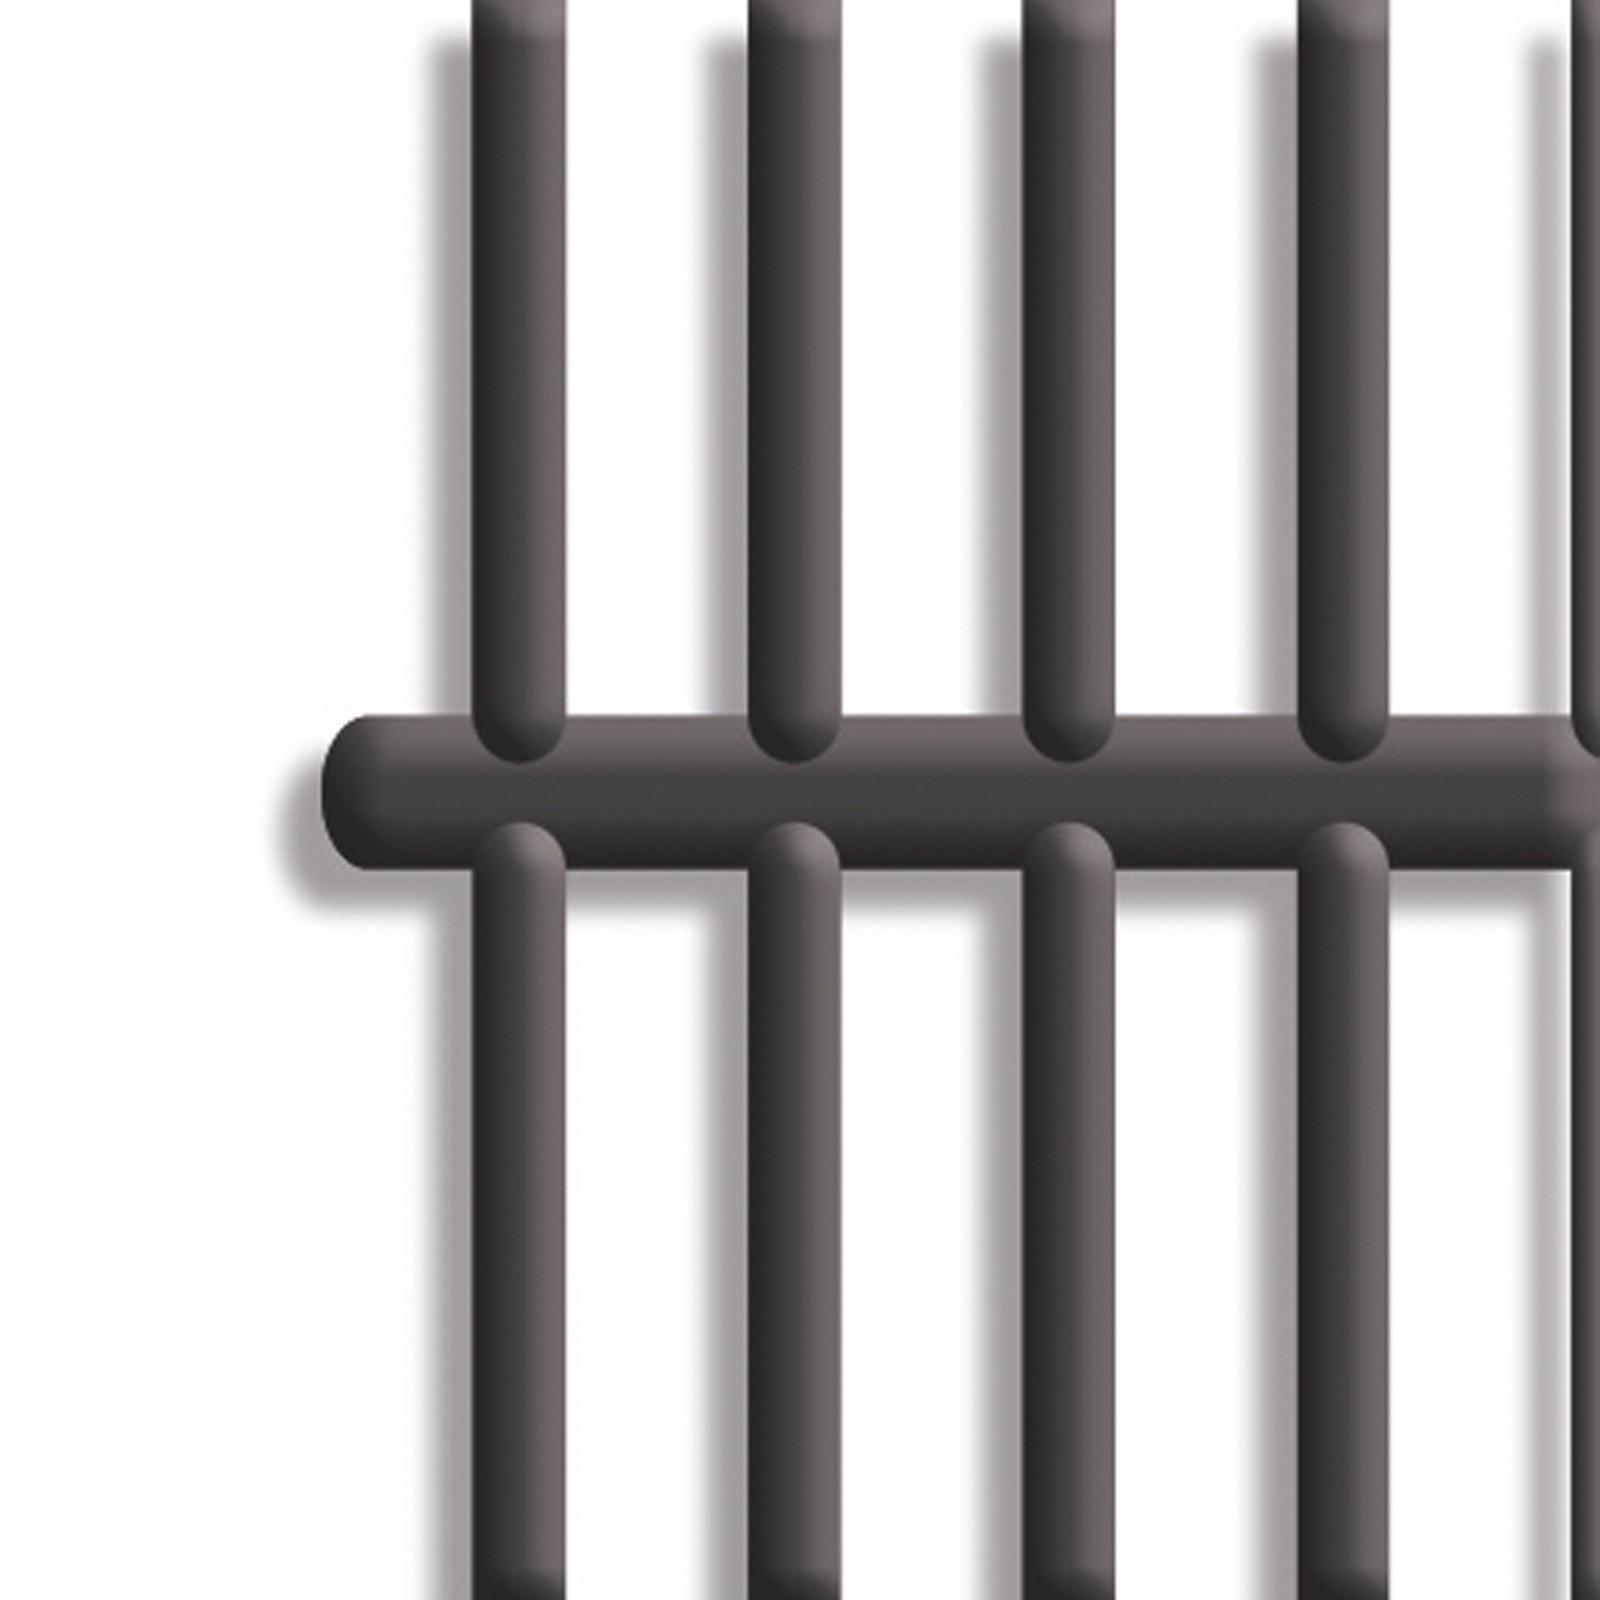 tepro universal guss grillrost set 2 x ca 36 x 40 cm. Black Bedroom Furniture Sets. Home Design Ideas